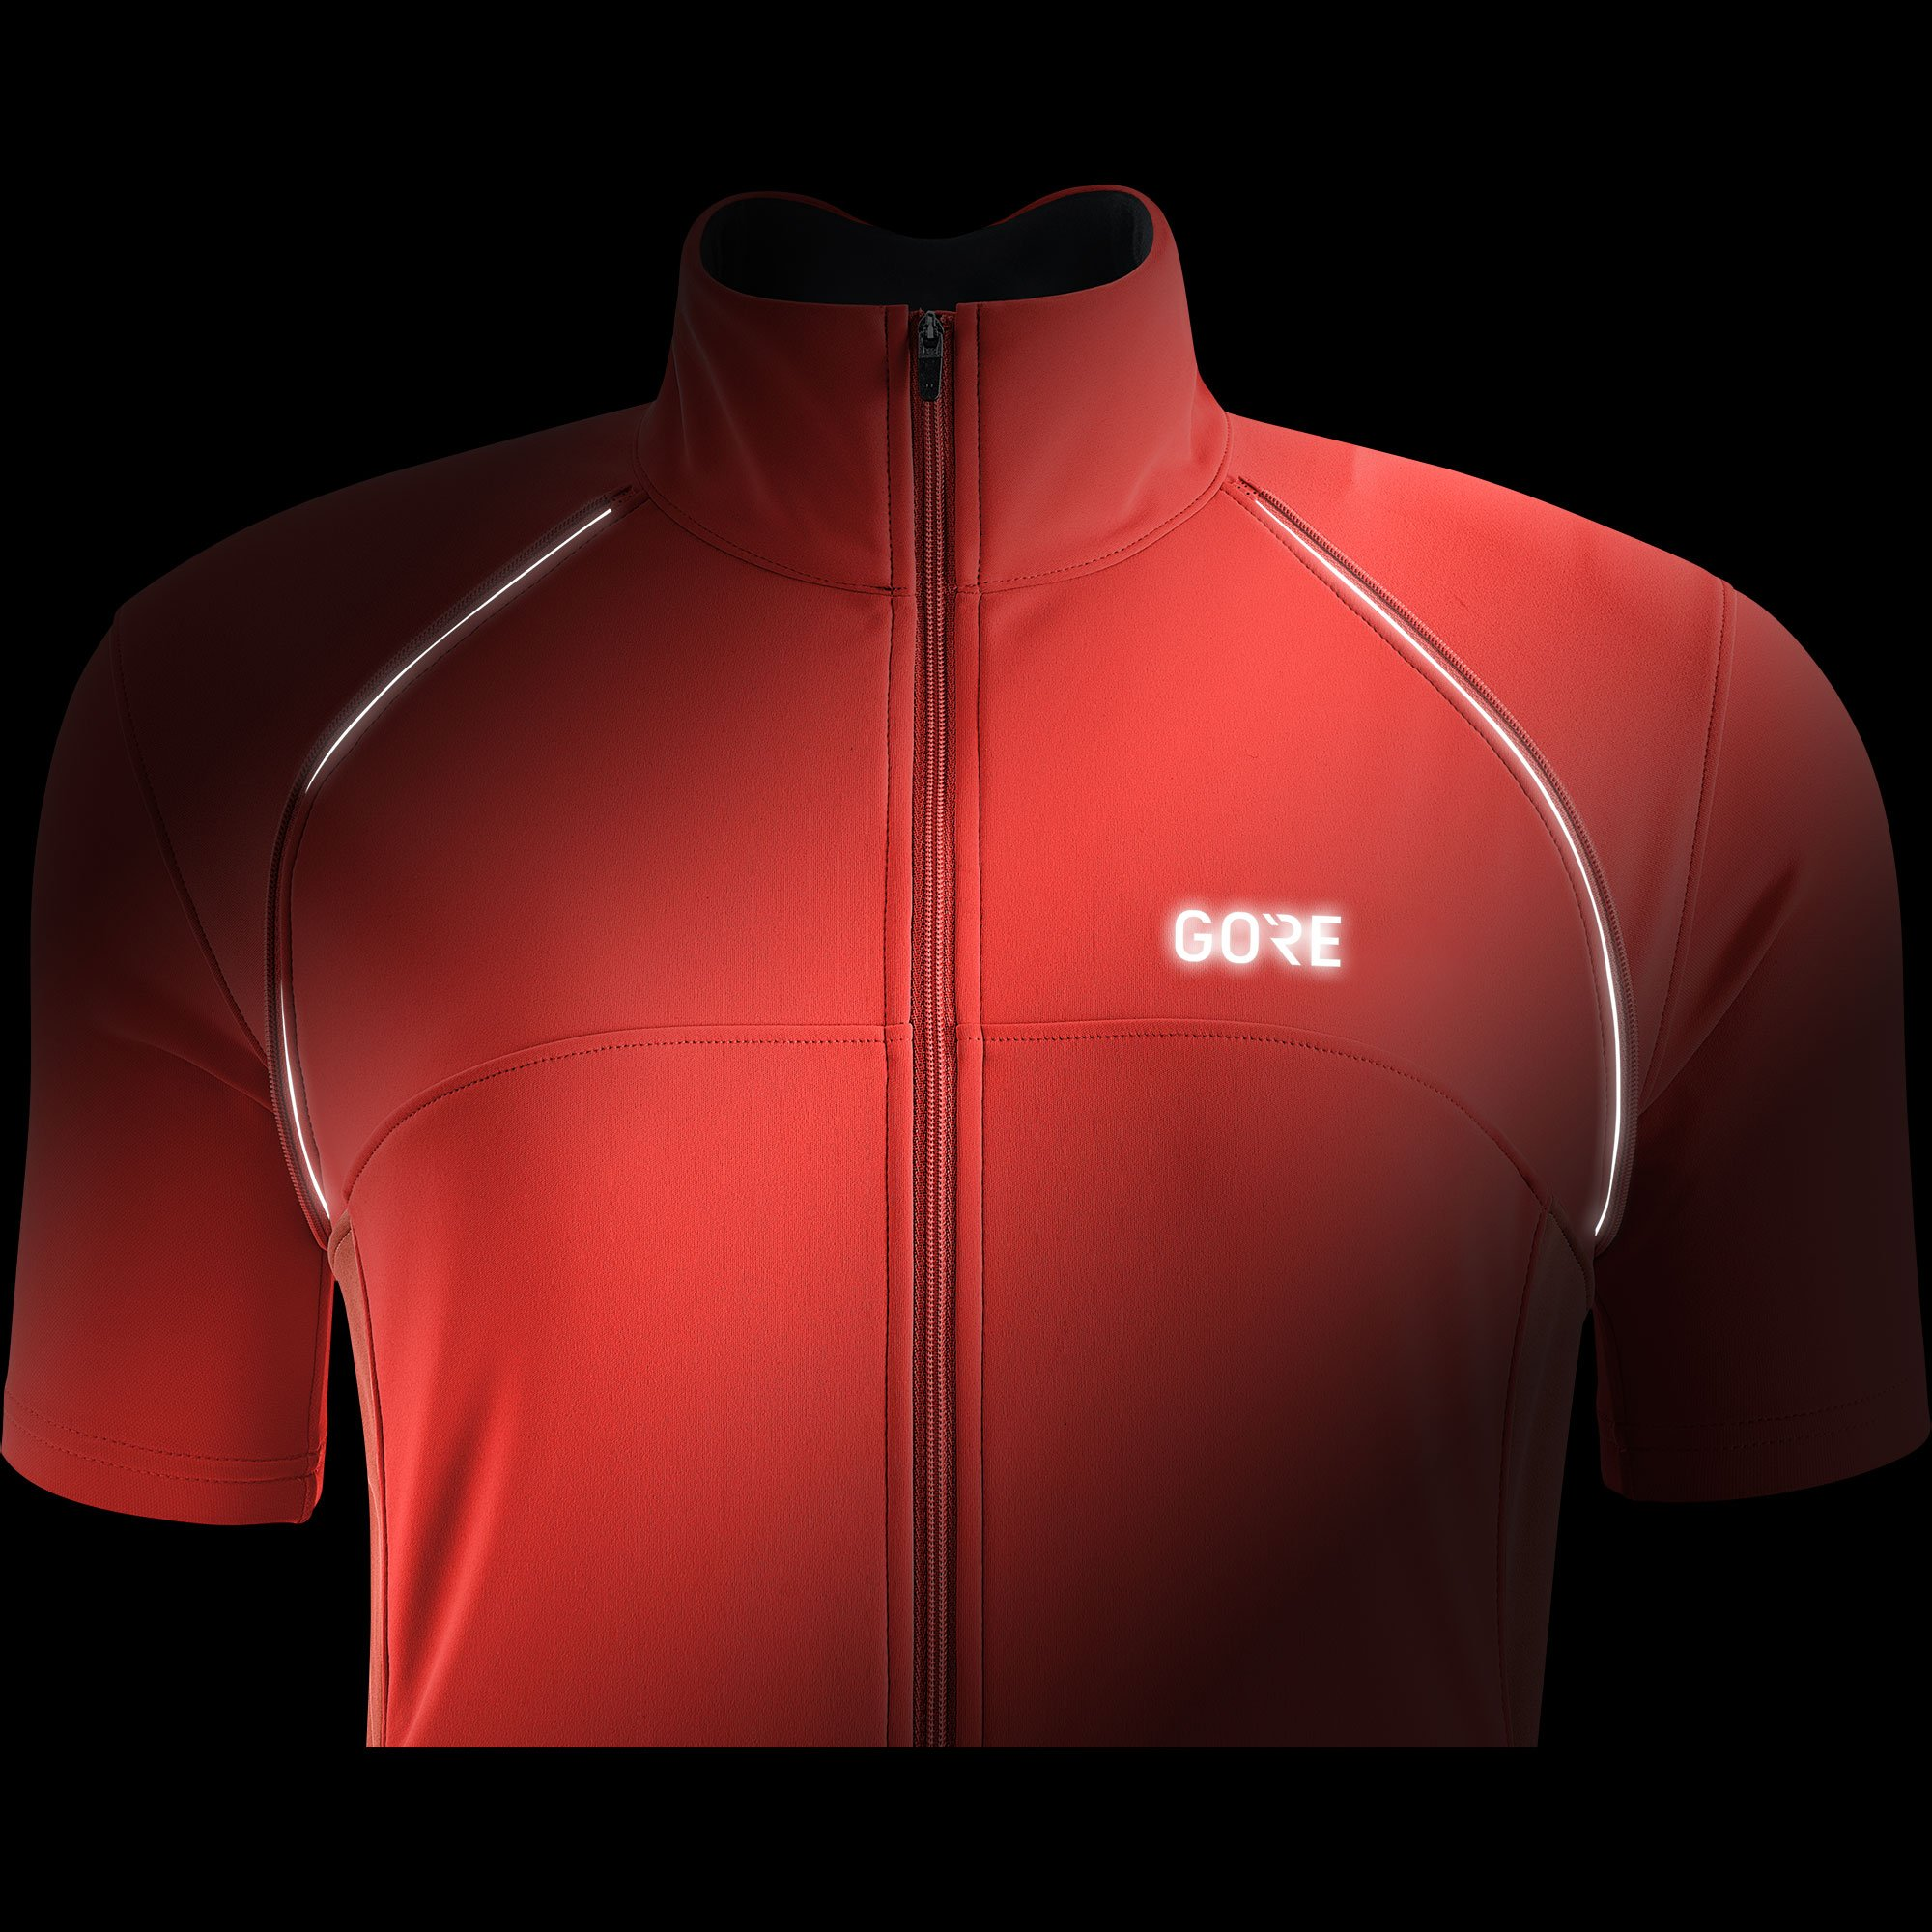 GORE Wear Women's Windproof Cycling Jacket, Removable Sleeves, GORE Wear C3 Women's GORE Wear WINDSTOPPER Phantom Zip-Off Jacket, Size: L, Color: Lumi Orange/Coral Glow, 100191 by GORE WEAR (Image #6)